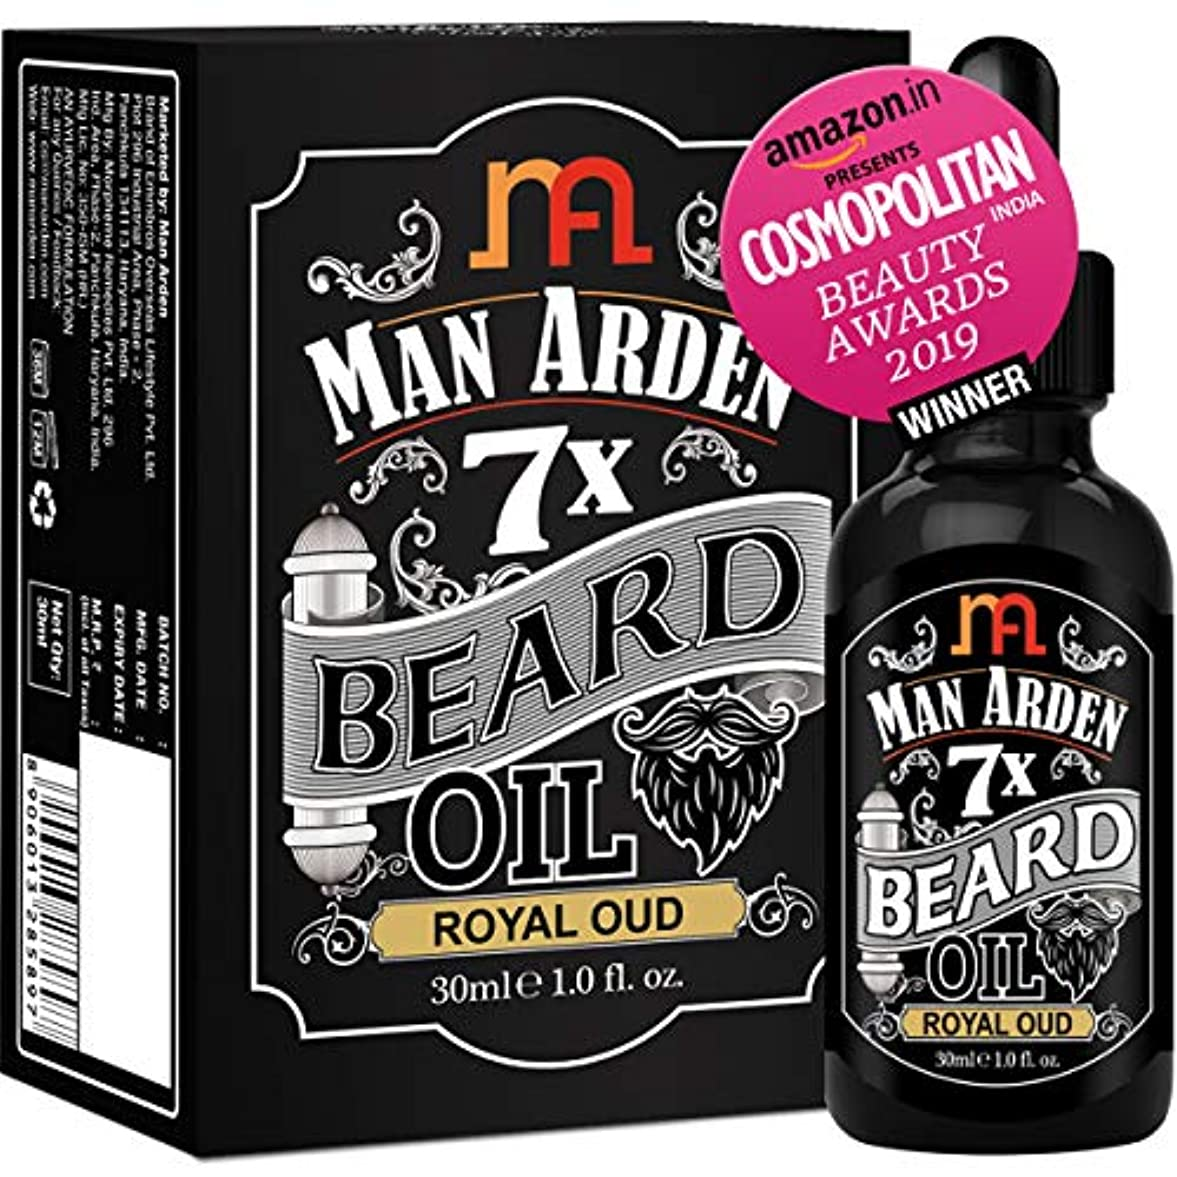 Man Arden 7X Beard Oil 30ml (Royal Oud) - 7 Premium Oils Blend For Beard Growth & Nourishment